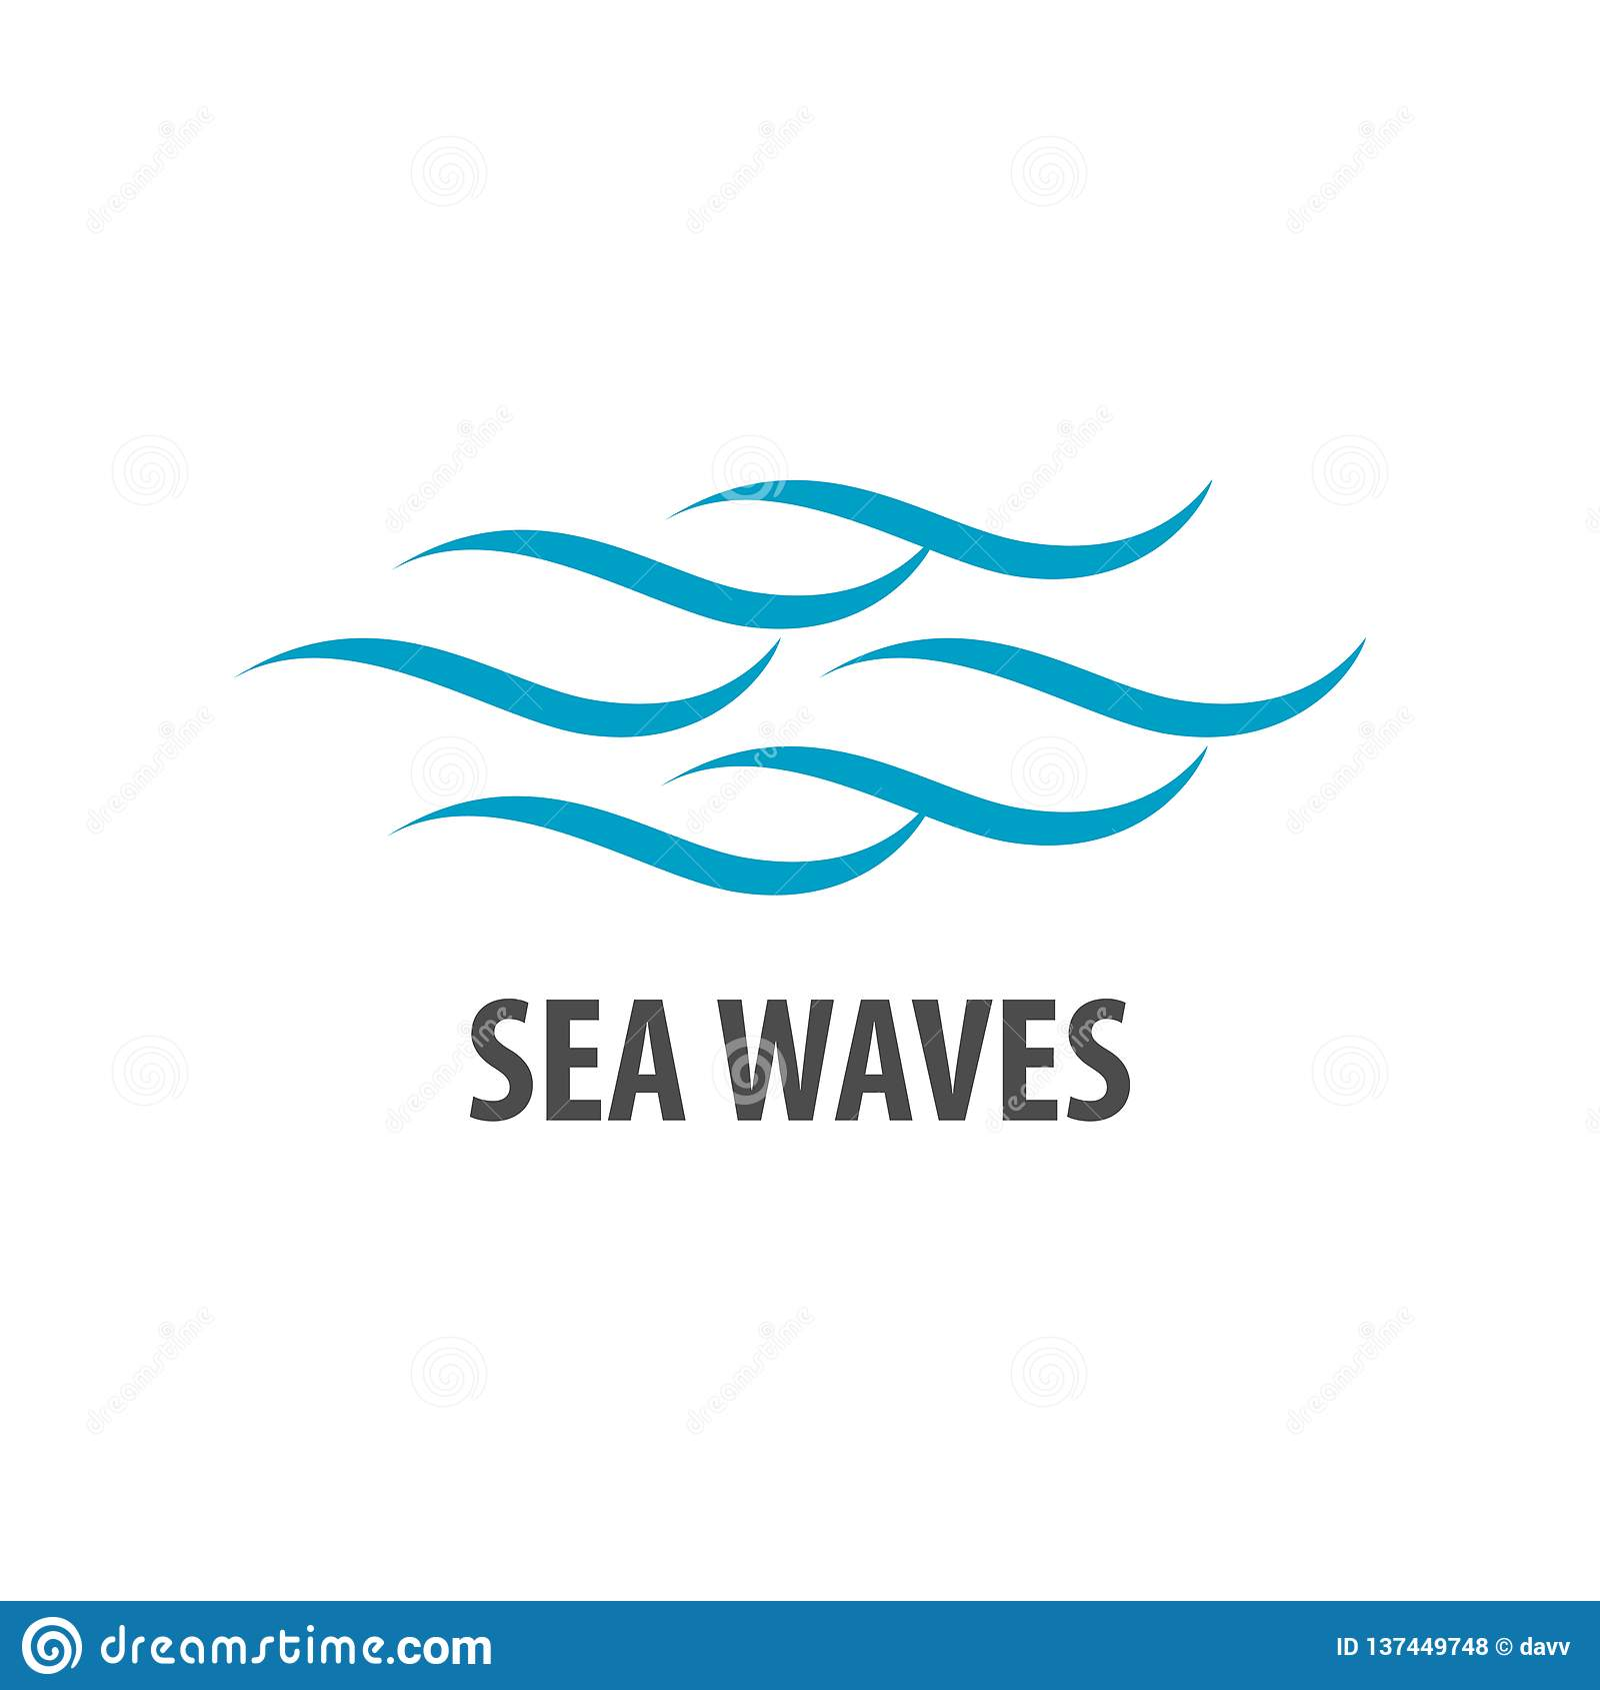 Simple Brush Line Sea Waves Logo Concept Design. Symbol